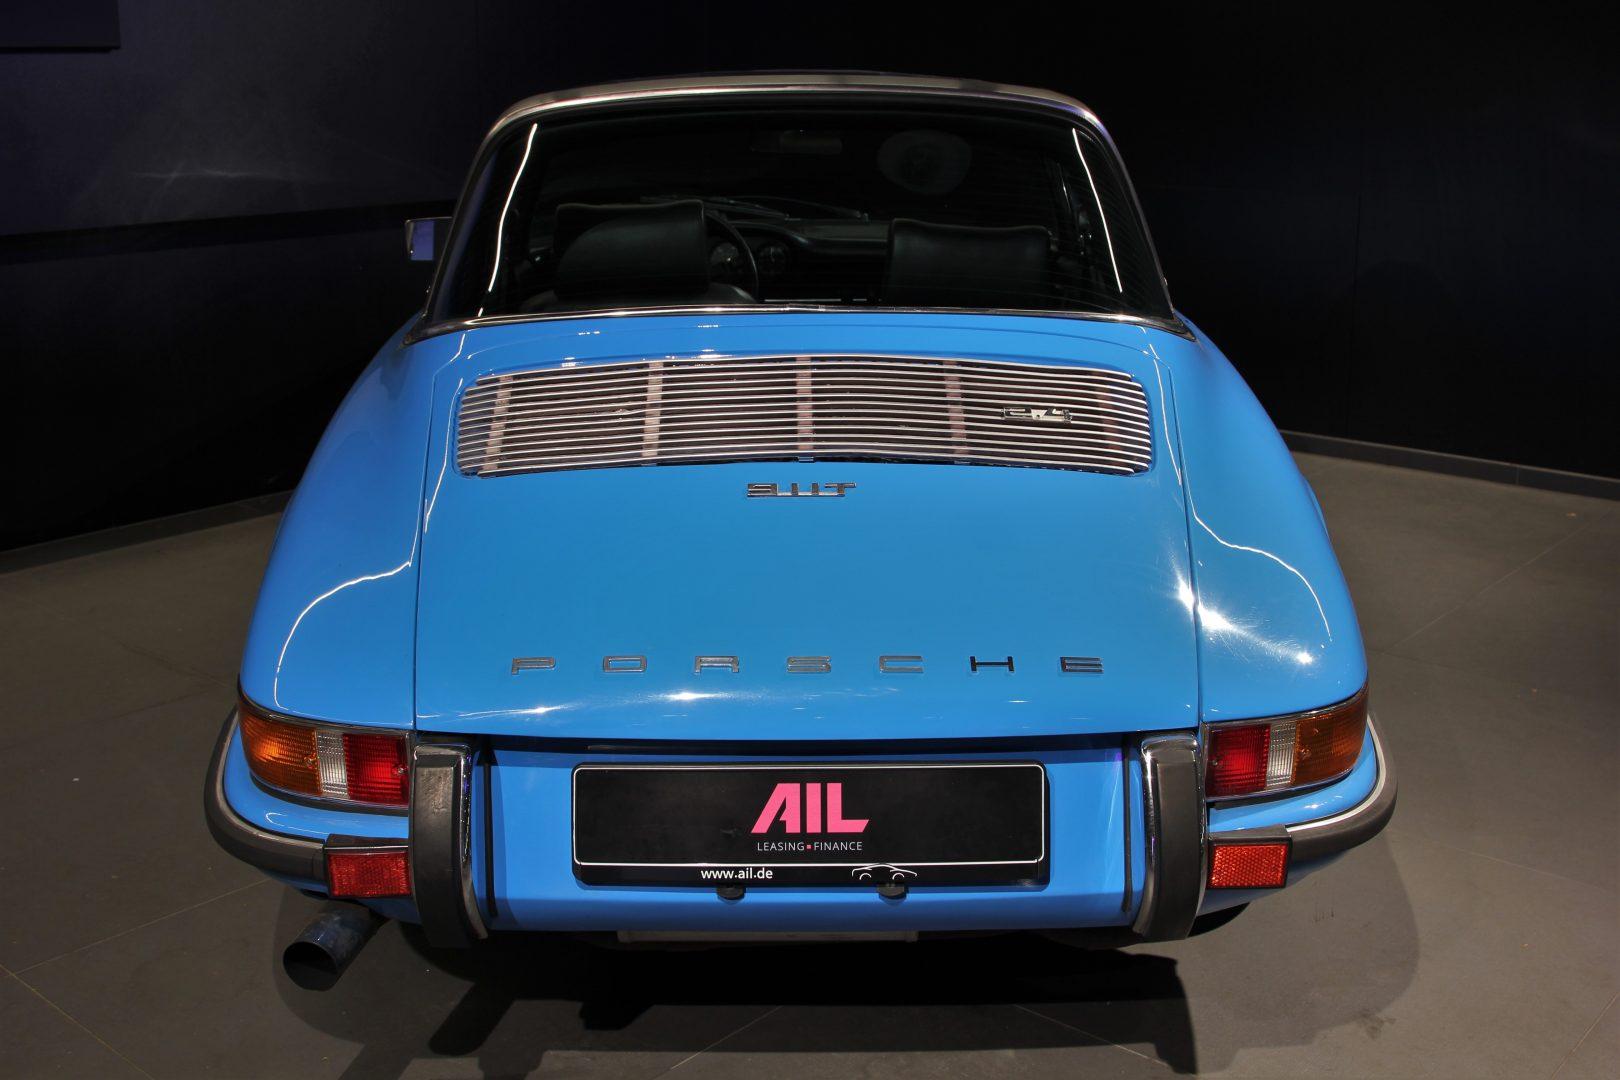 AIL Porsche 911 T Oelklappe  2